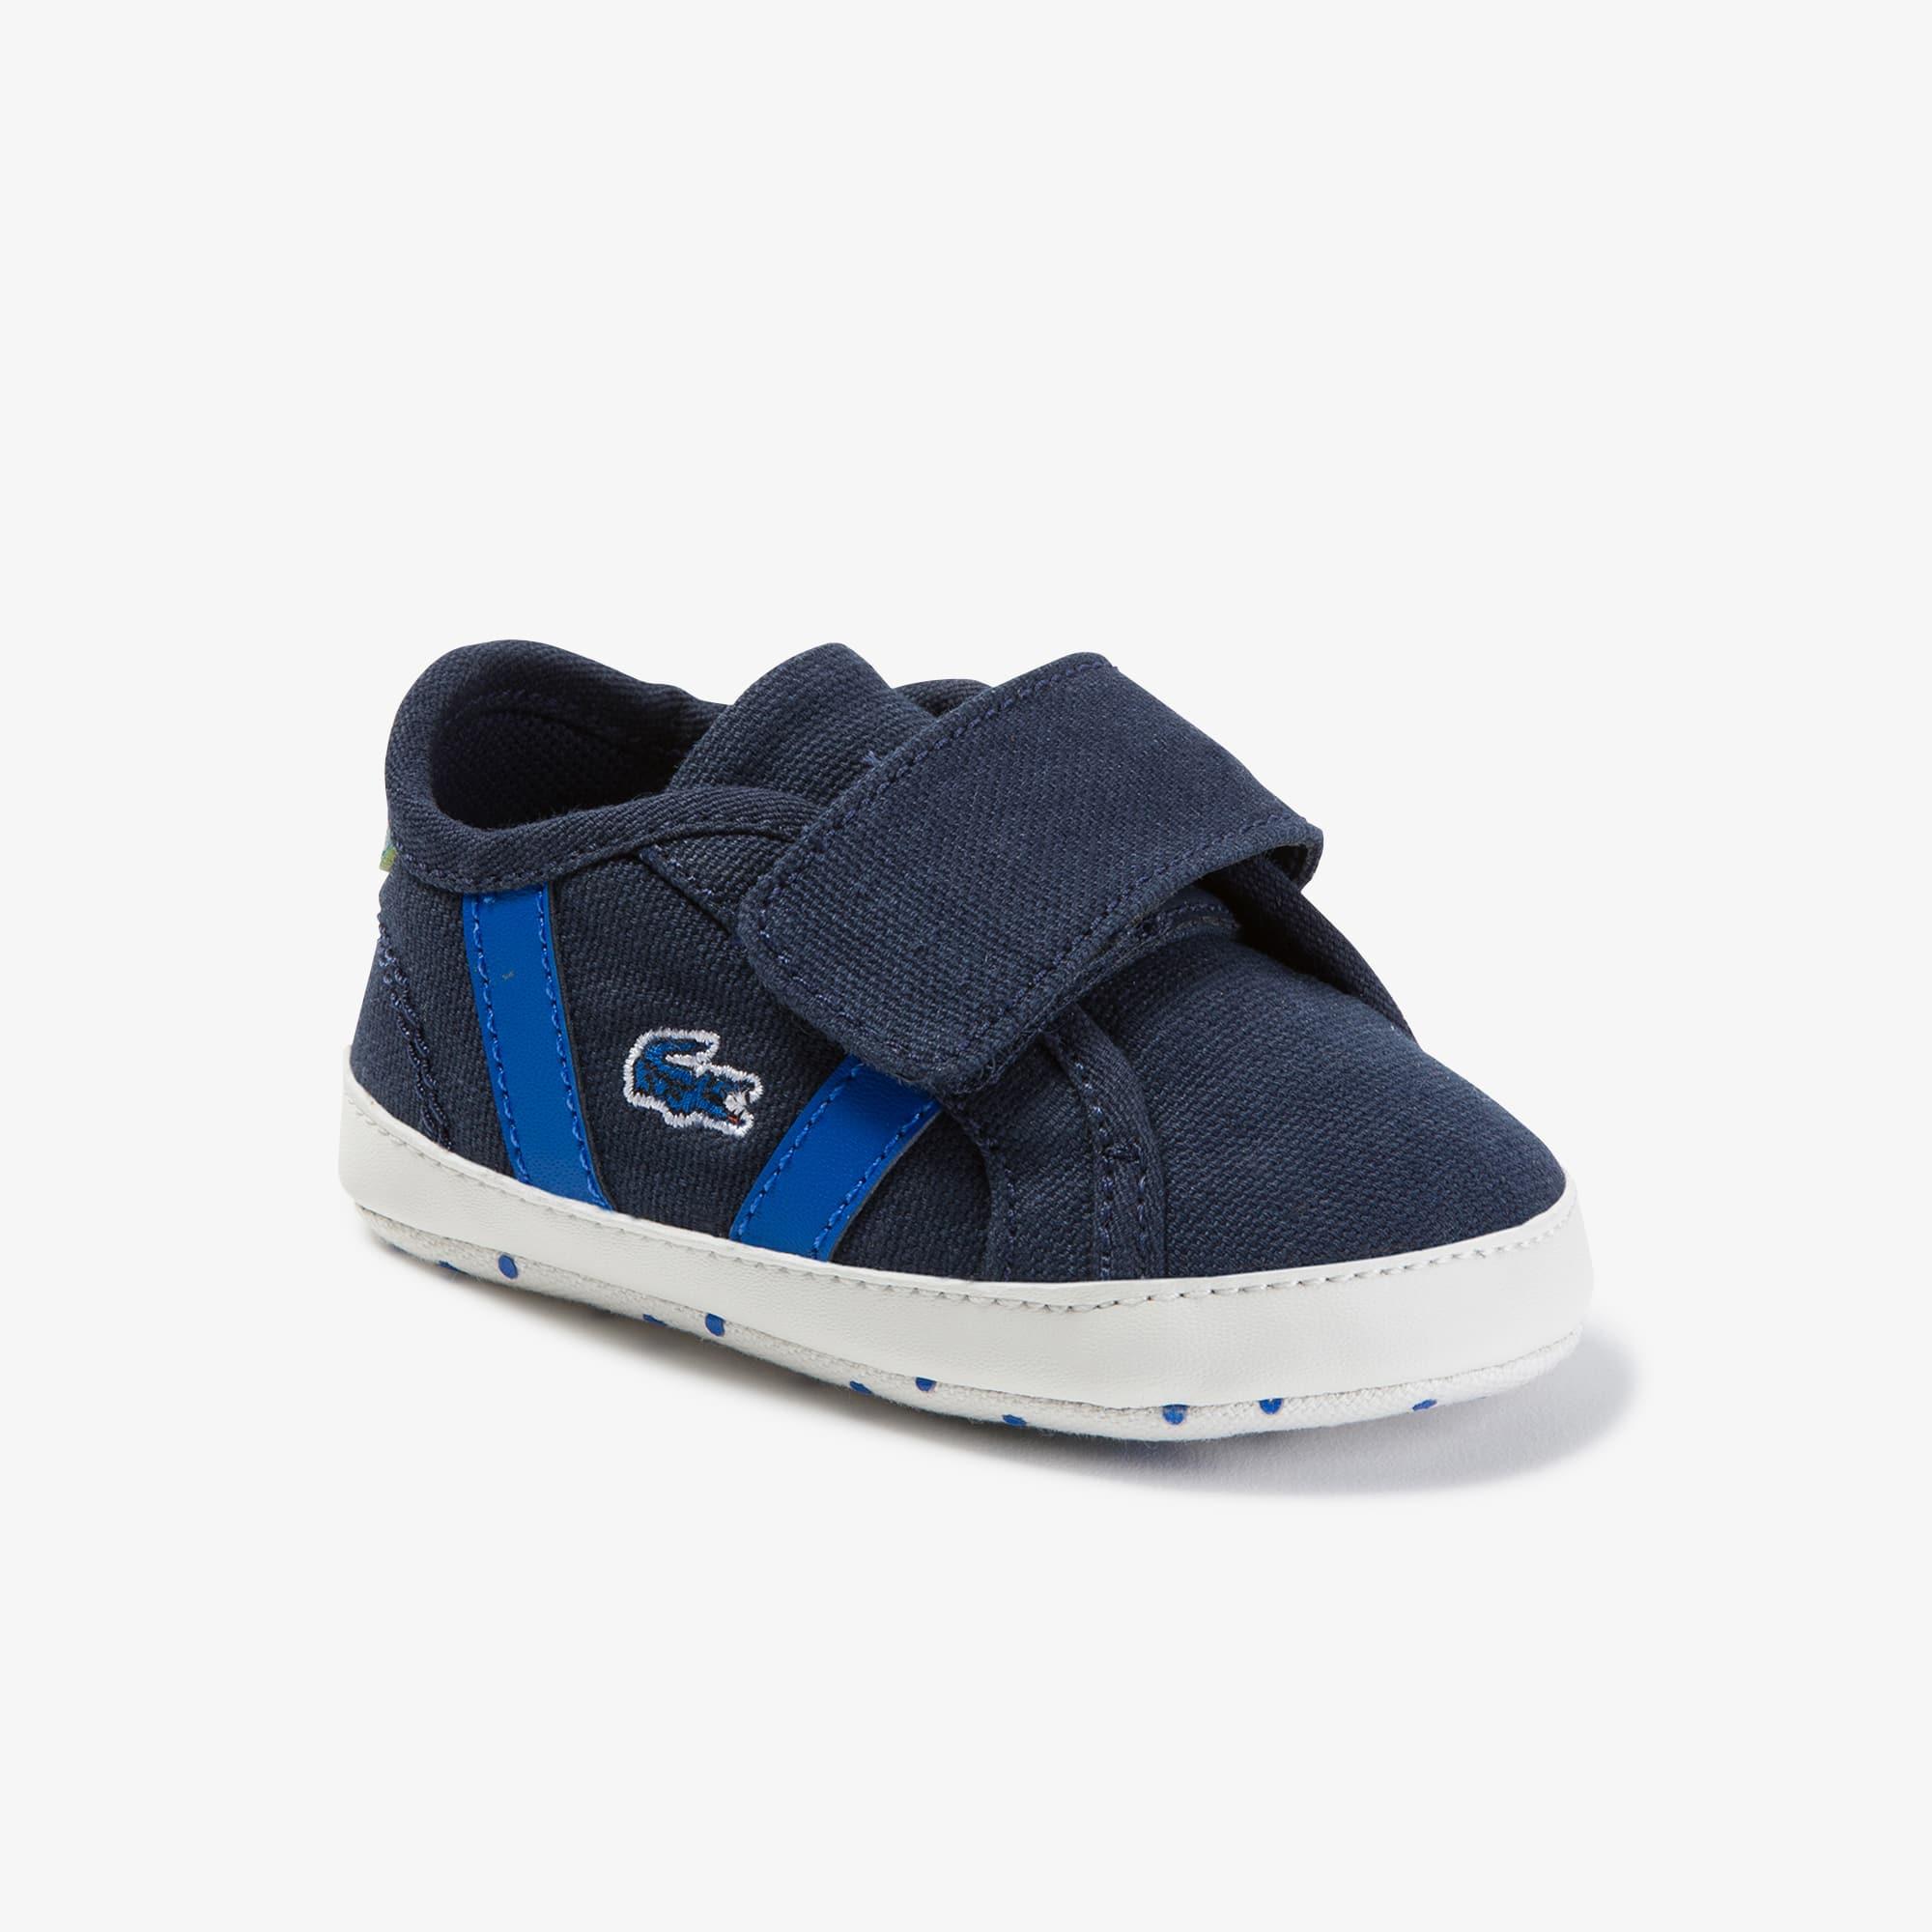 Lacoste Sneakers Sideline bébé en toile Taille 17 Marine/vert